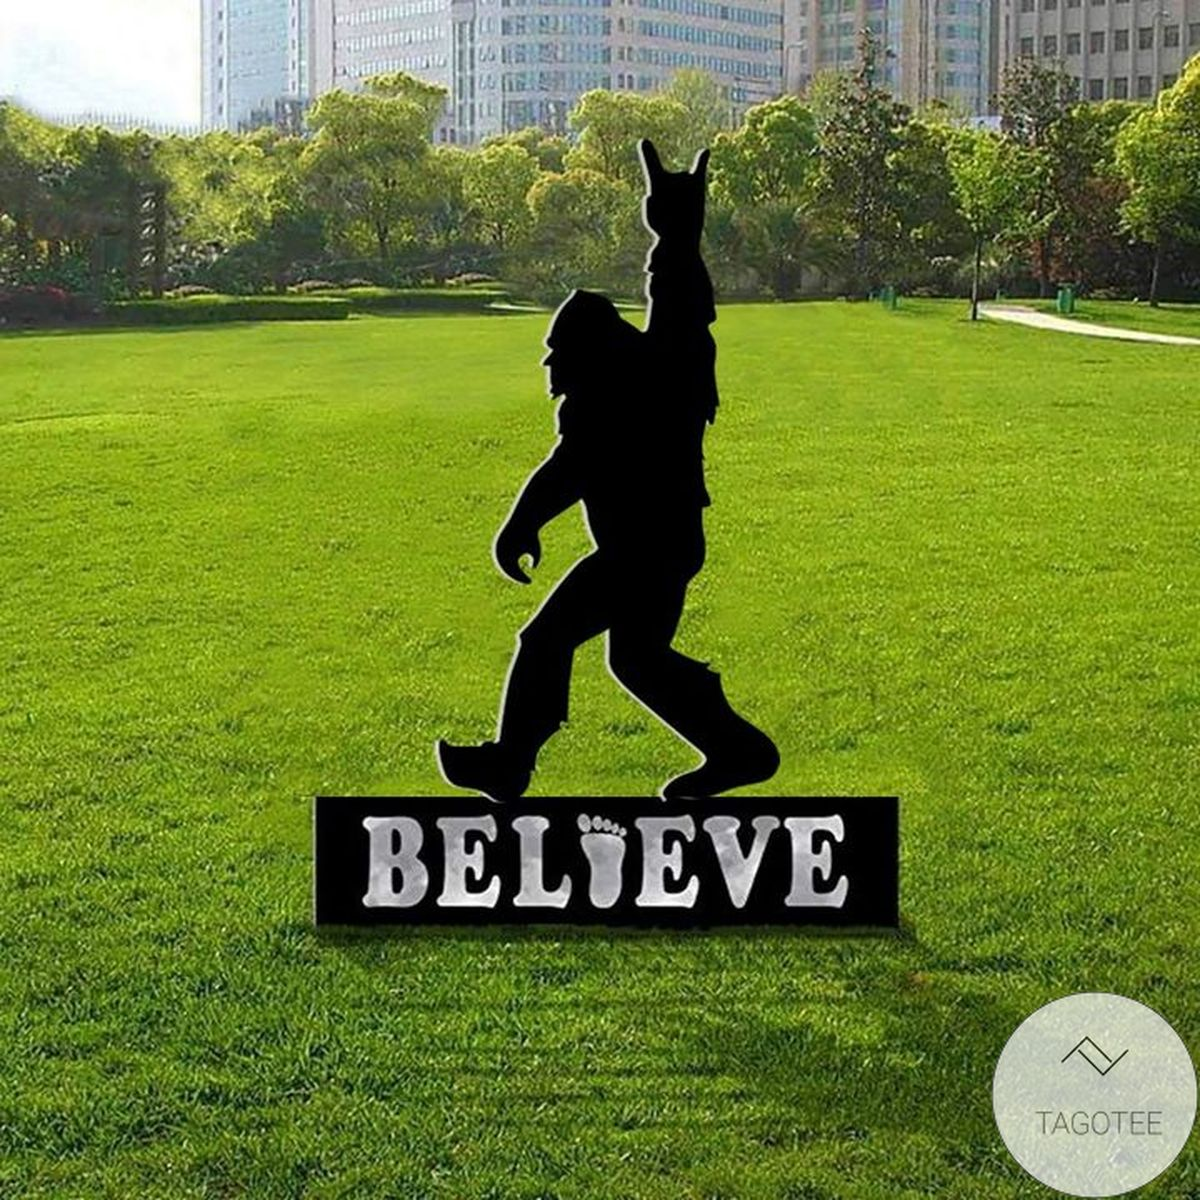 Adorable Bigfoot Believer Sasquatch Sign Yard Sign